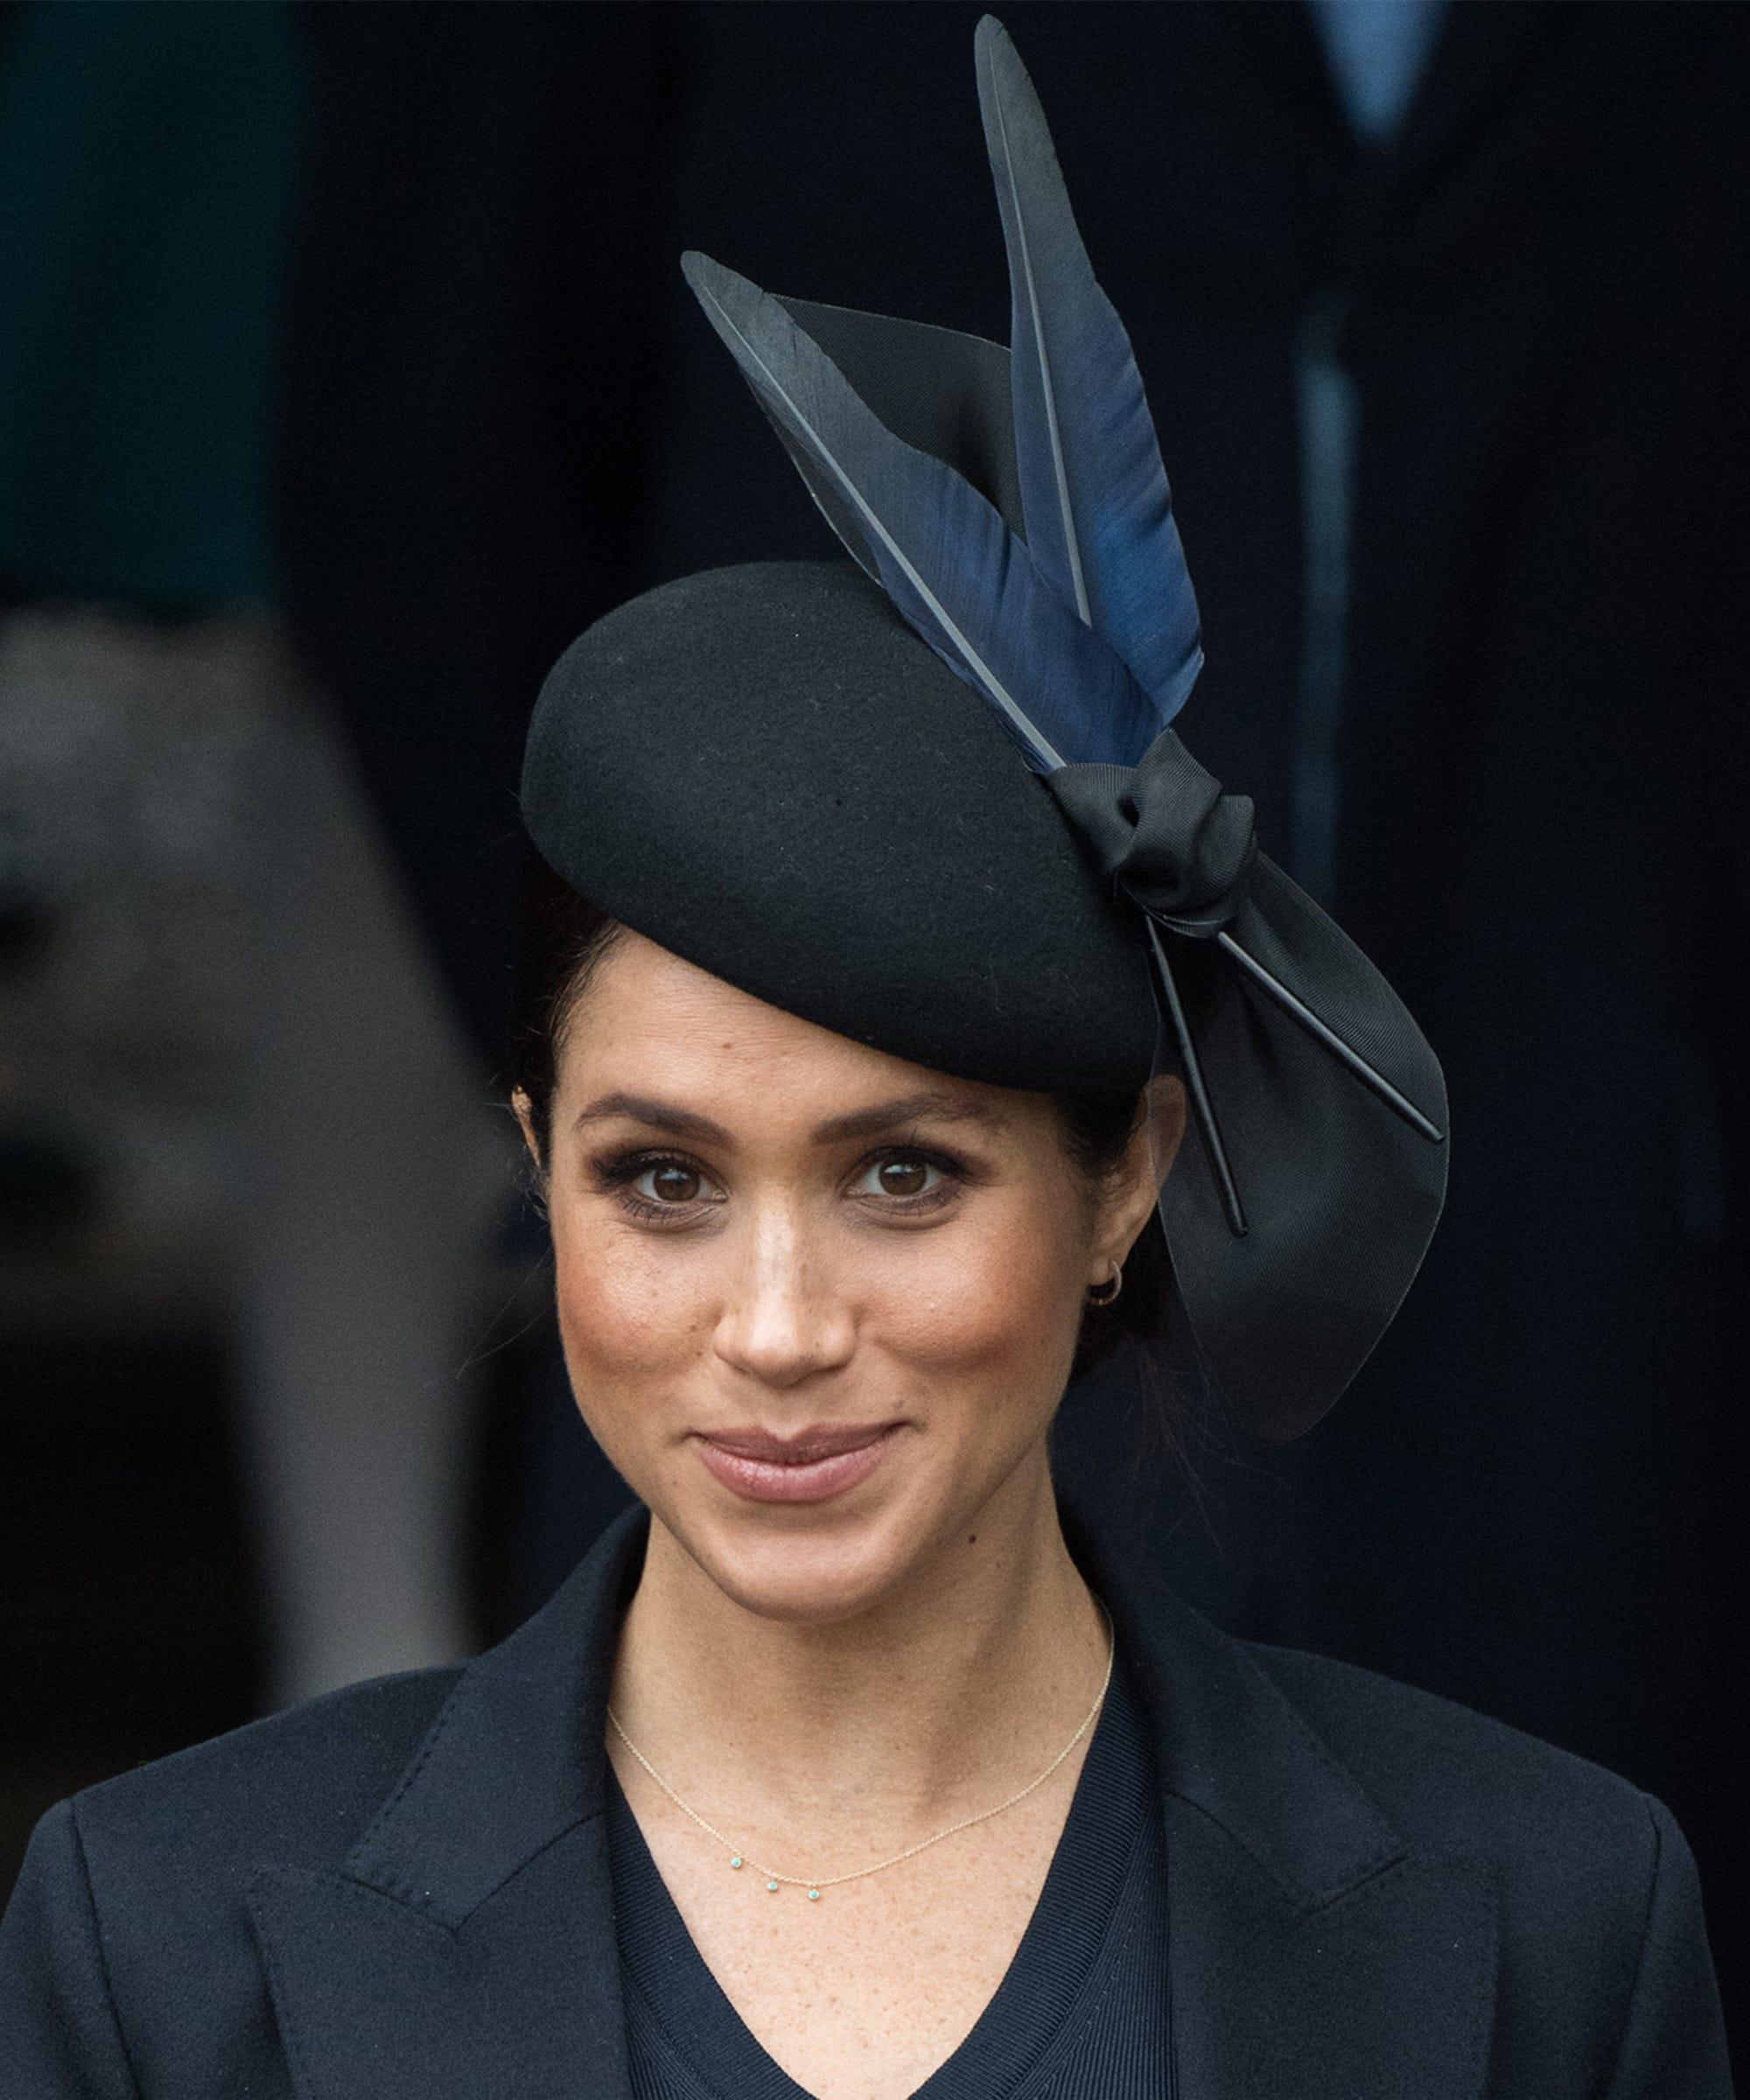 Suits Pokes Fun At Meghan Markle's Royal Status